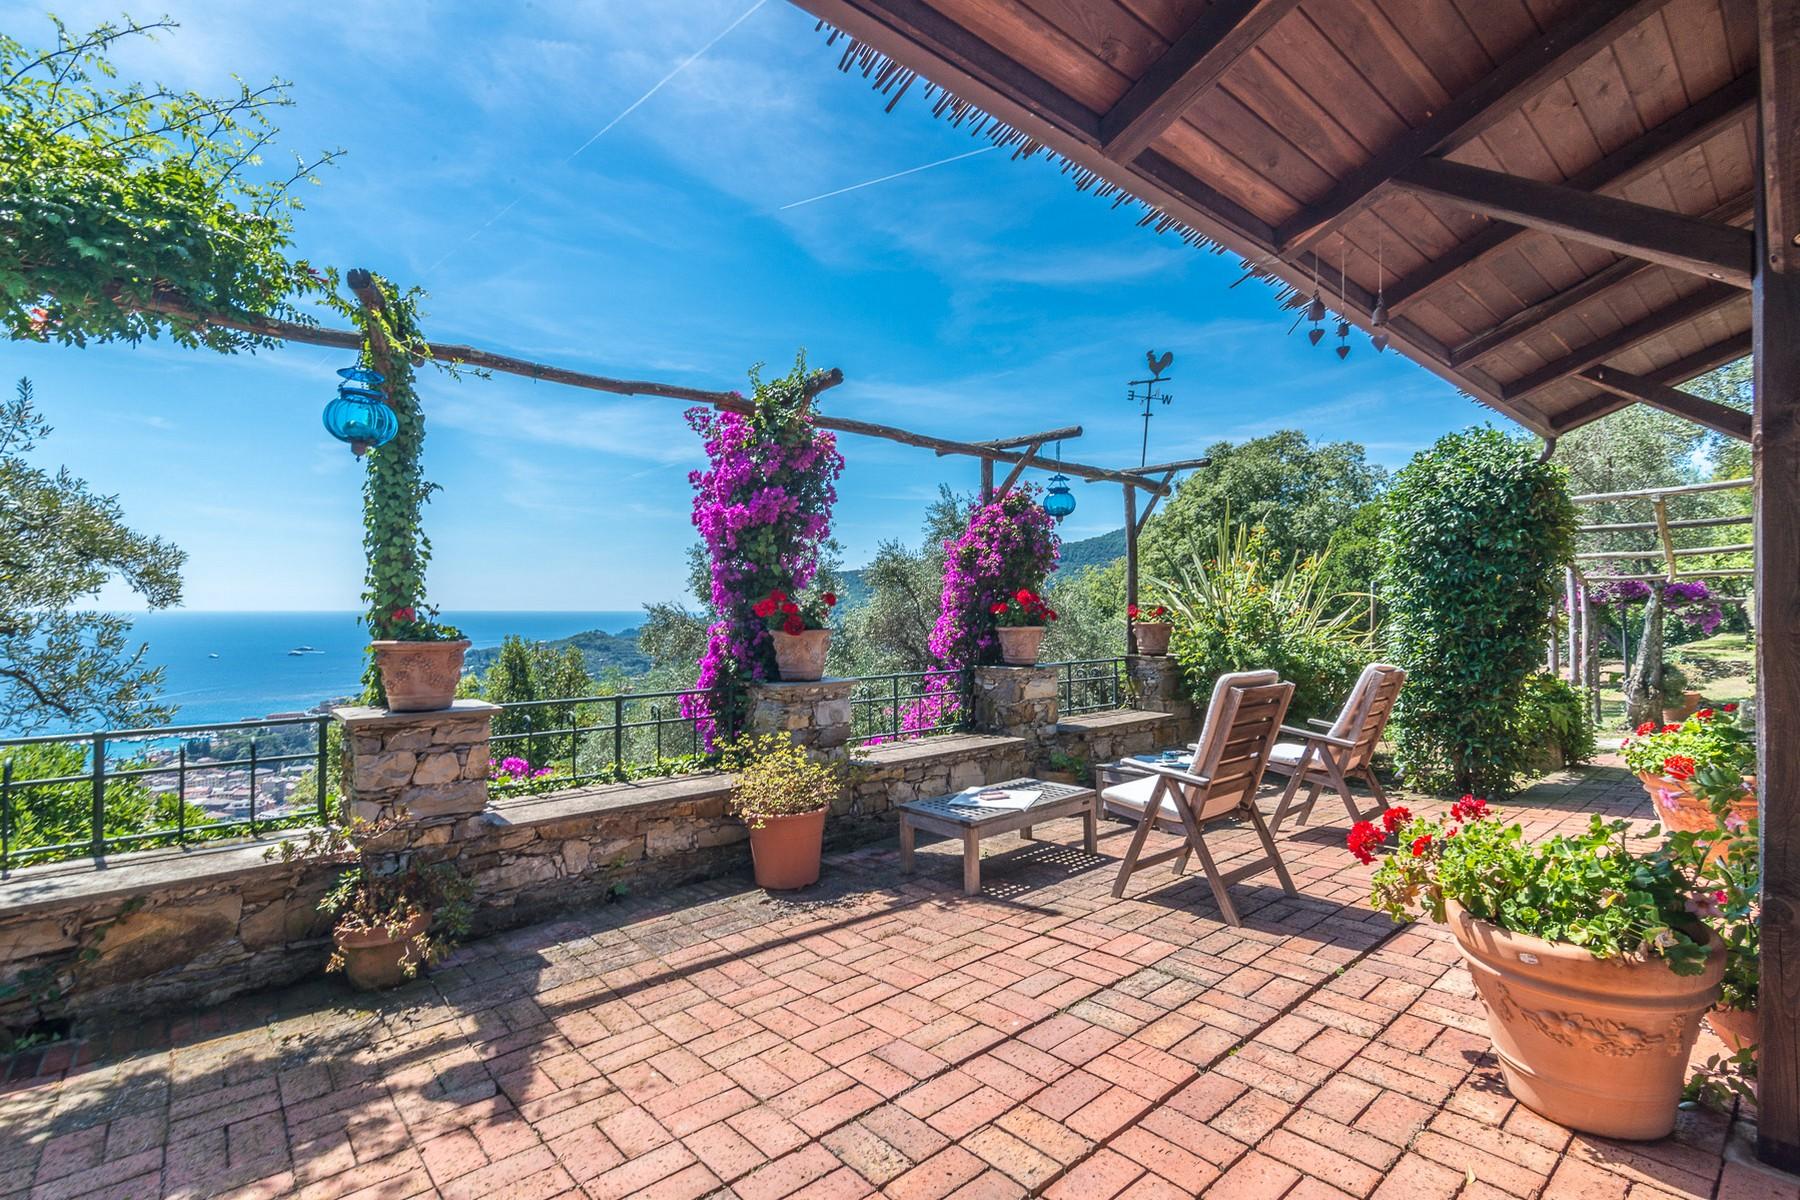 Villa in Vendita a Santa Margherita Ligure via aurelia